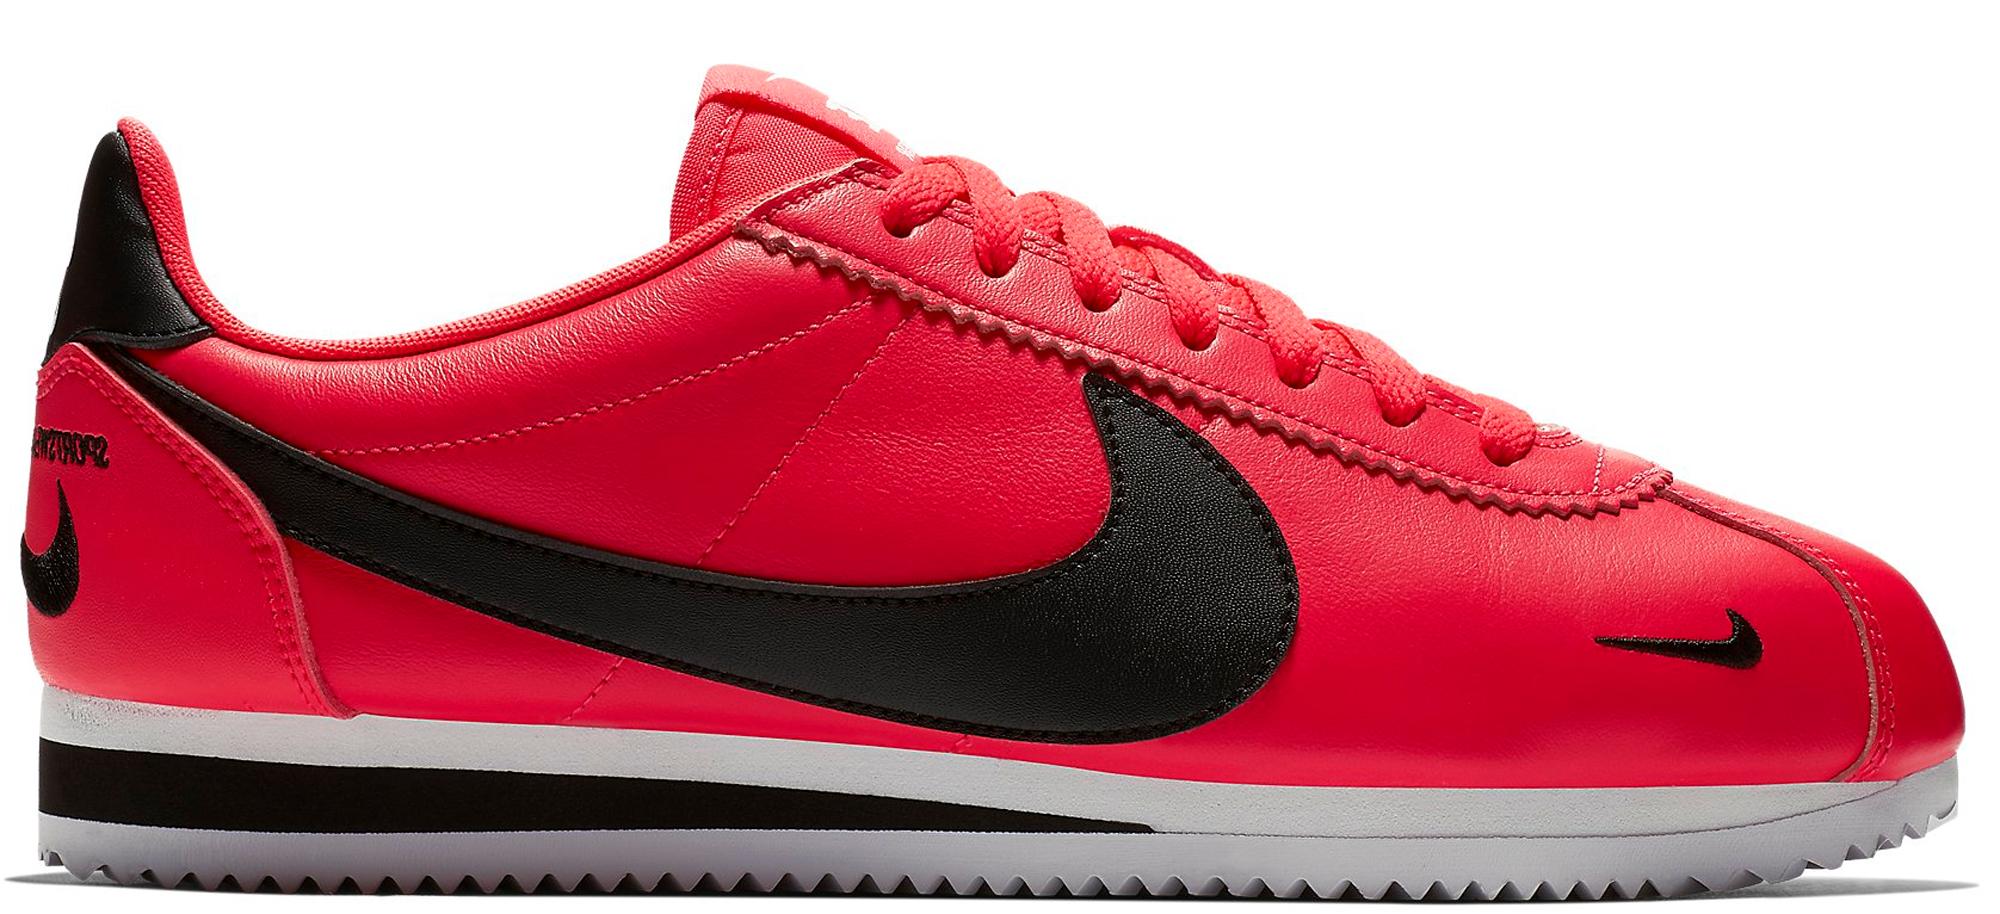 Nike Classic Cortez Overbranding Red Orbit